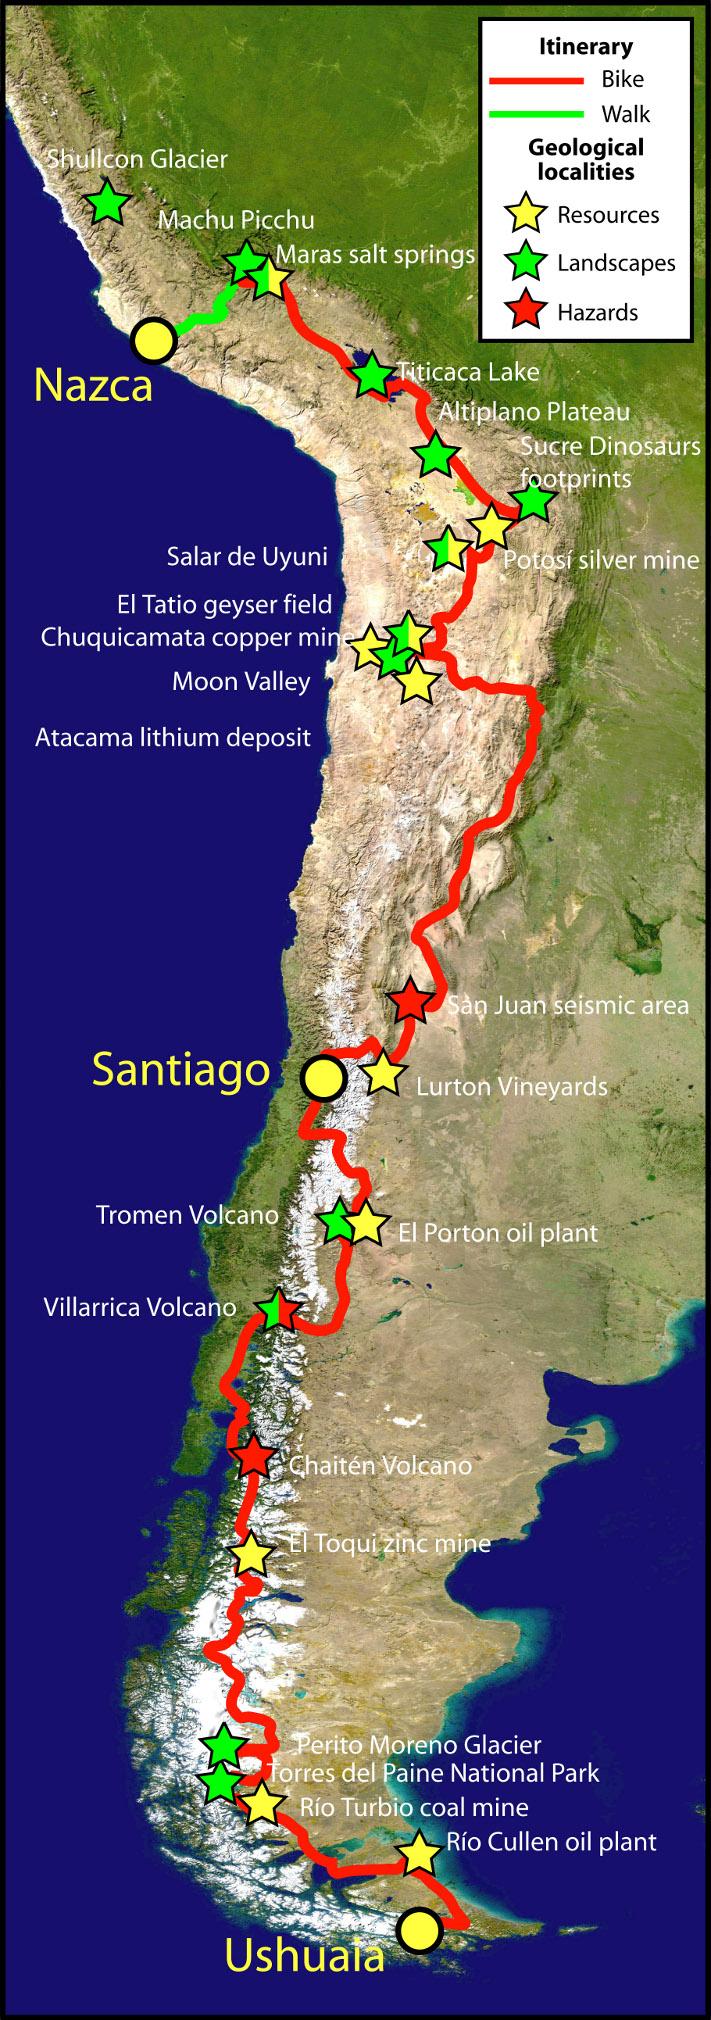 kart andesfjellene Geo365 | I geologiens tjeneste kart andesfjellene